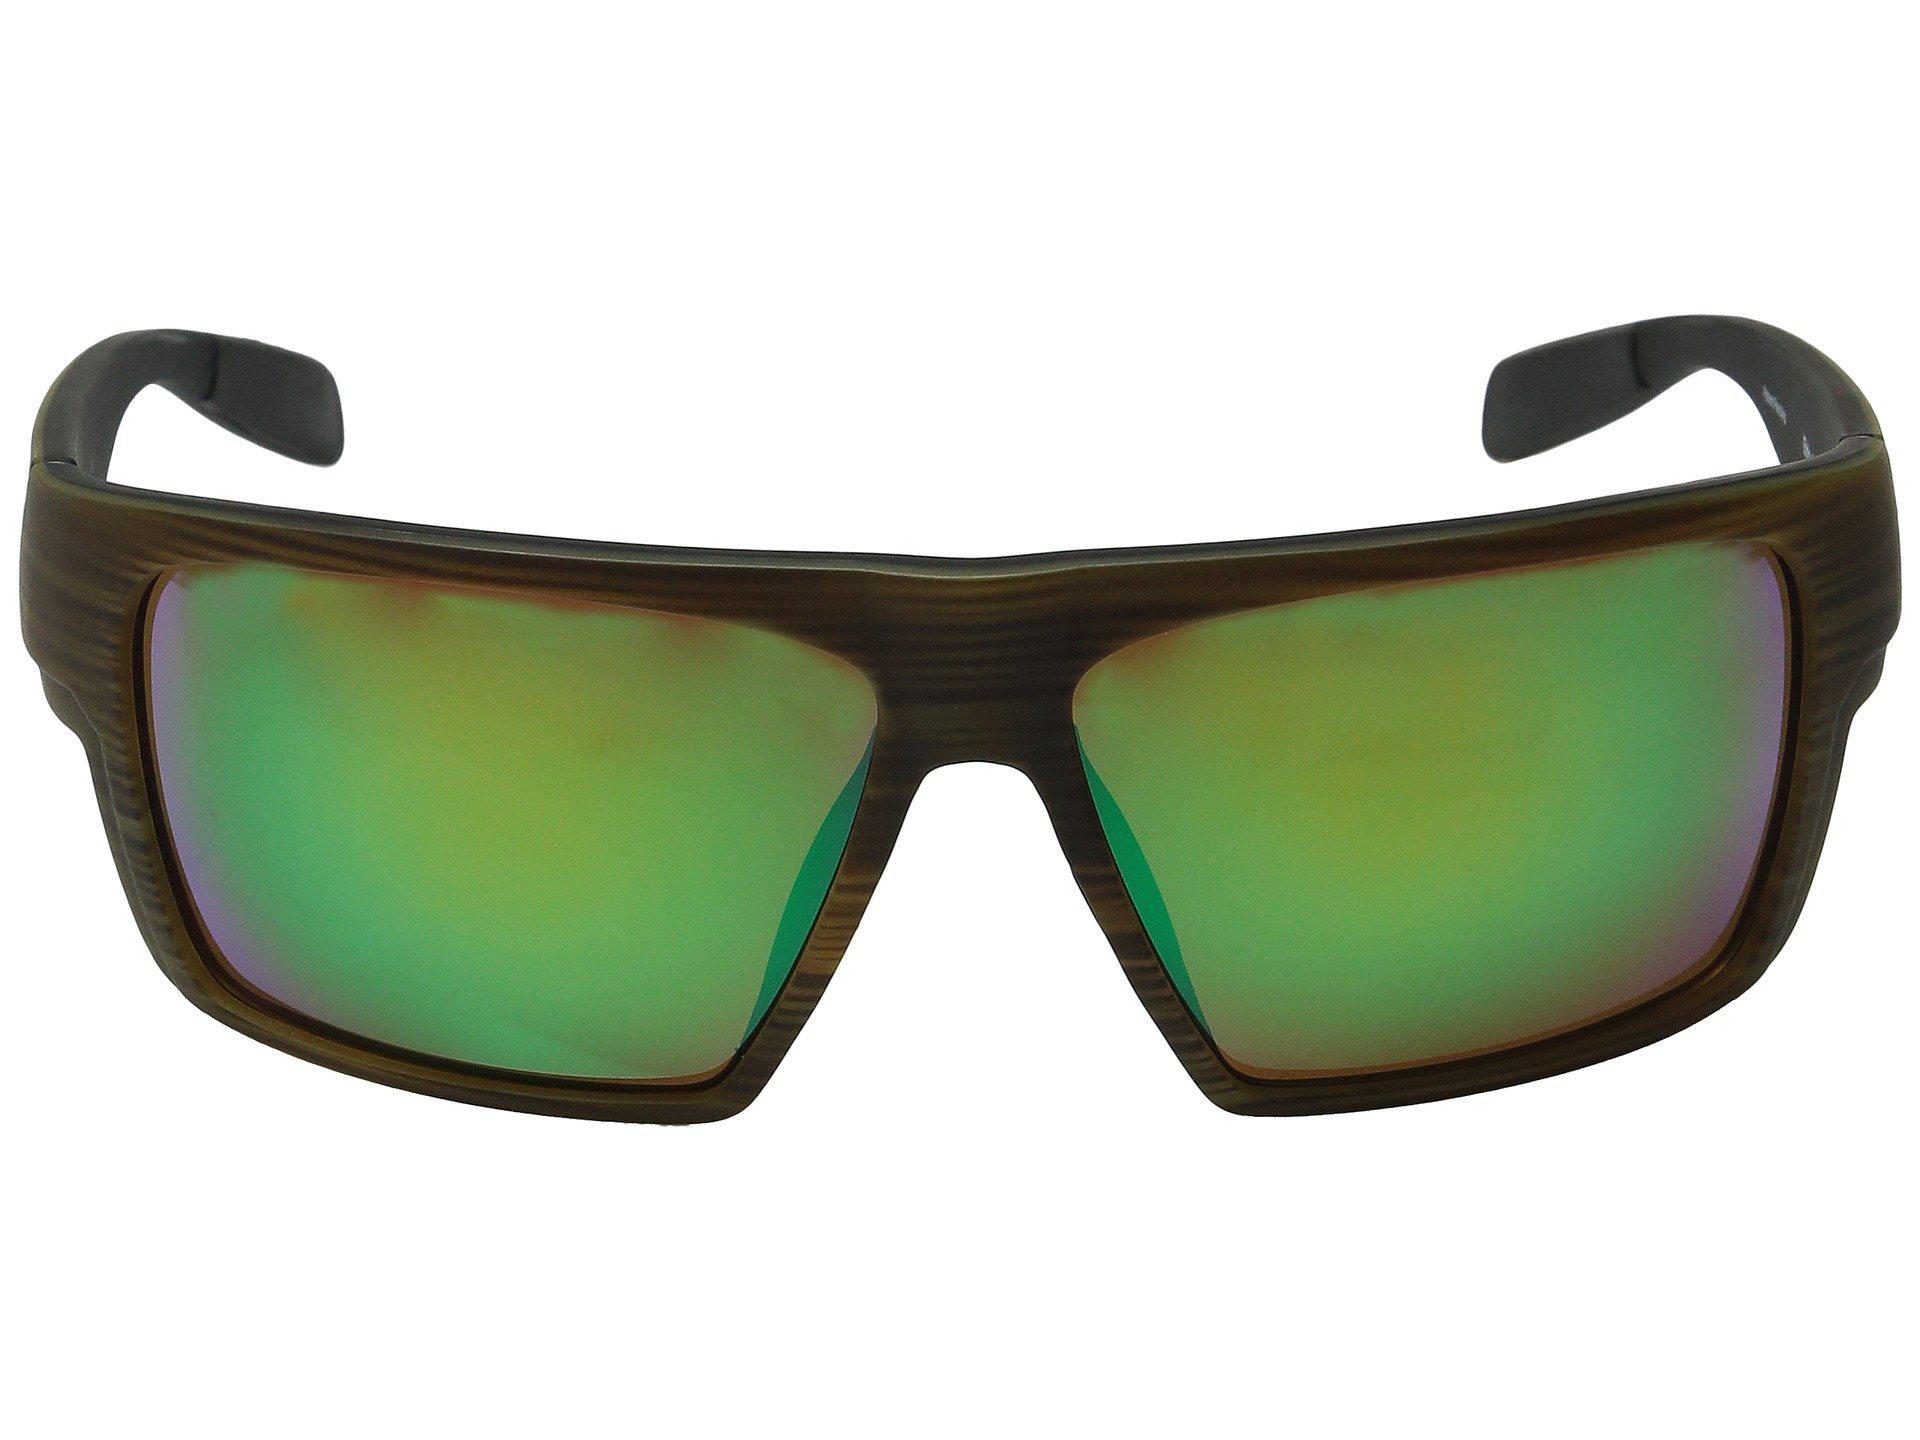 c3bbb055895 Lyst - Native Eyewear Eldo (asphalt dark Gray asphalt gray) Sport ...